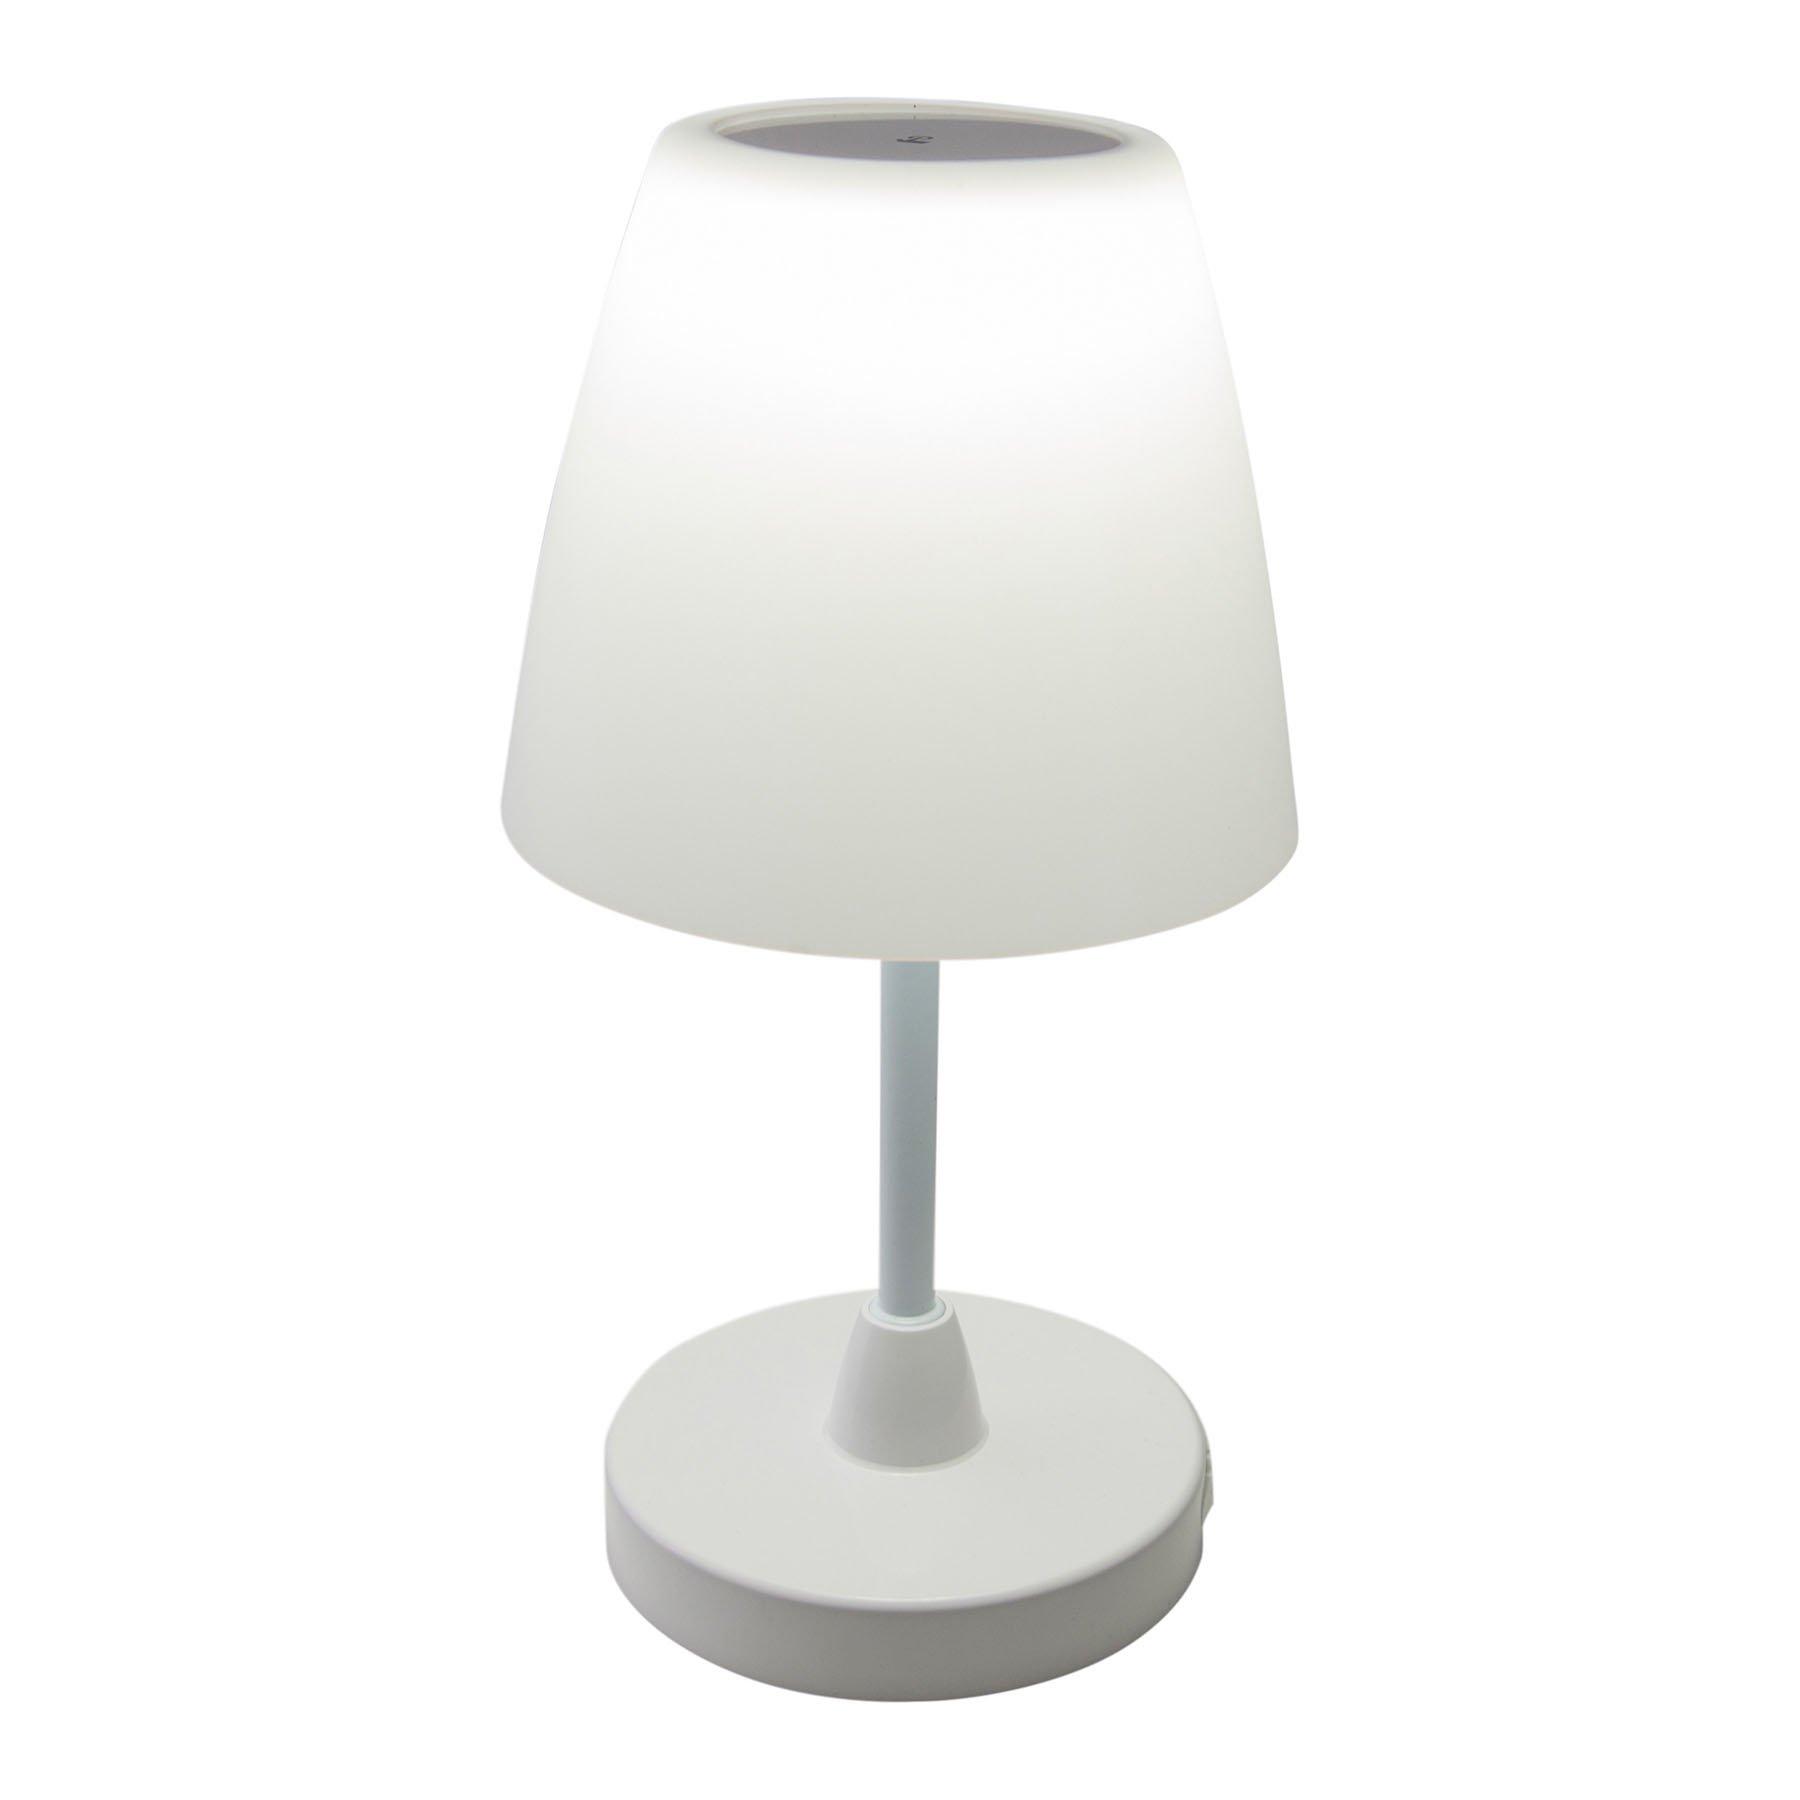 Toora LED-batteri-bordlampe, dimbar, IP44, berør.